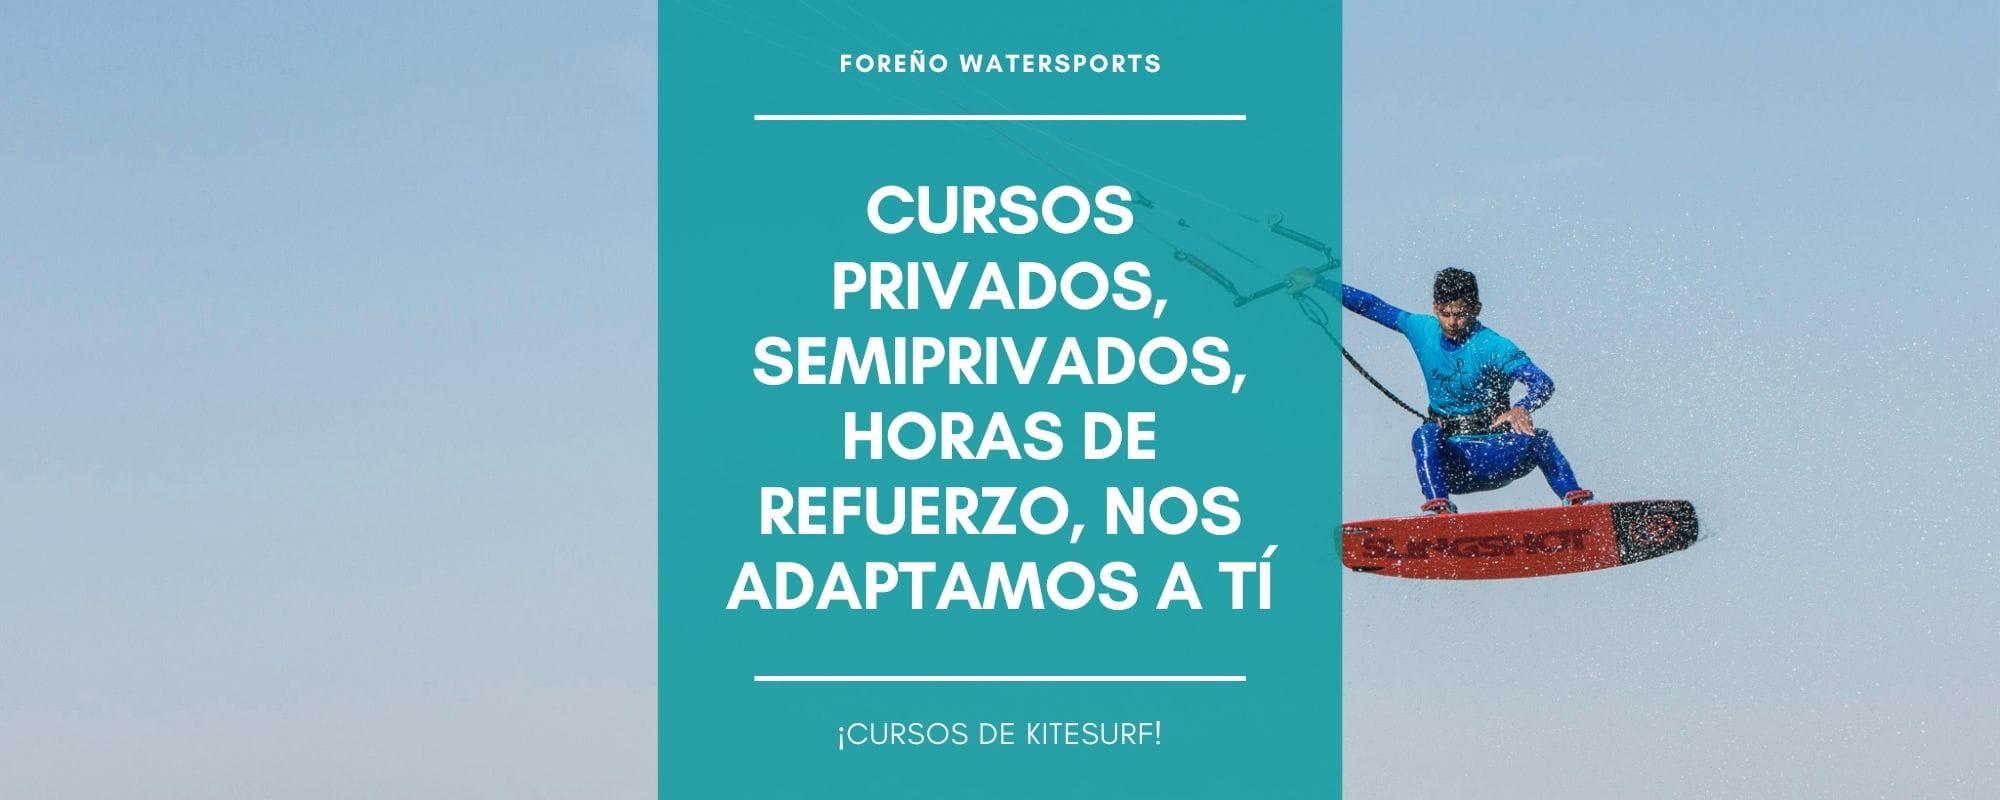 cURSOS DE KITESURF 1